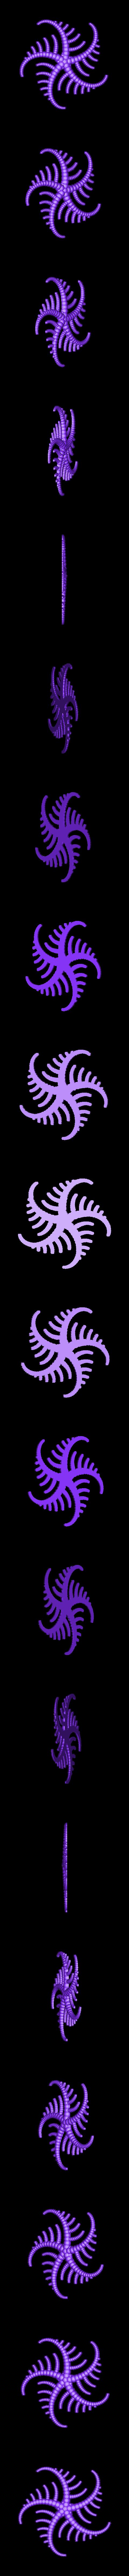 5_tentacles.stl Download free STL file Tentacle generator • 3D print object, ferjerez3d